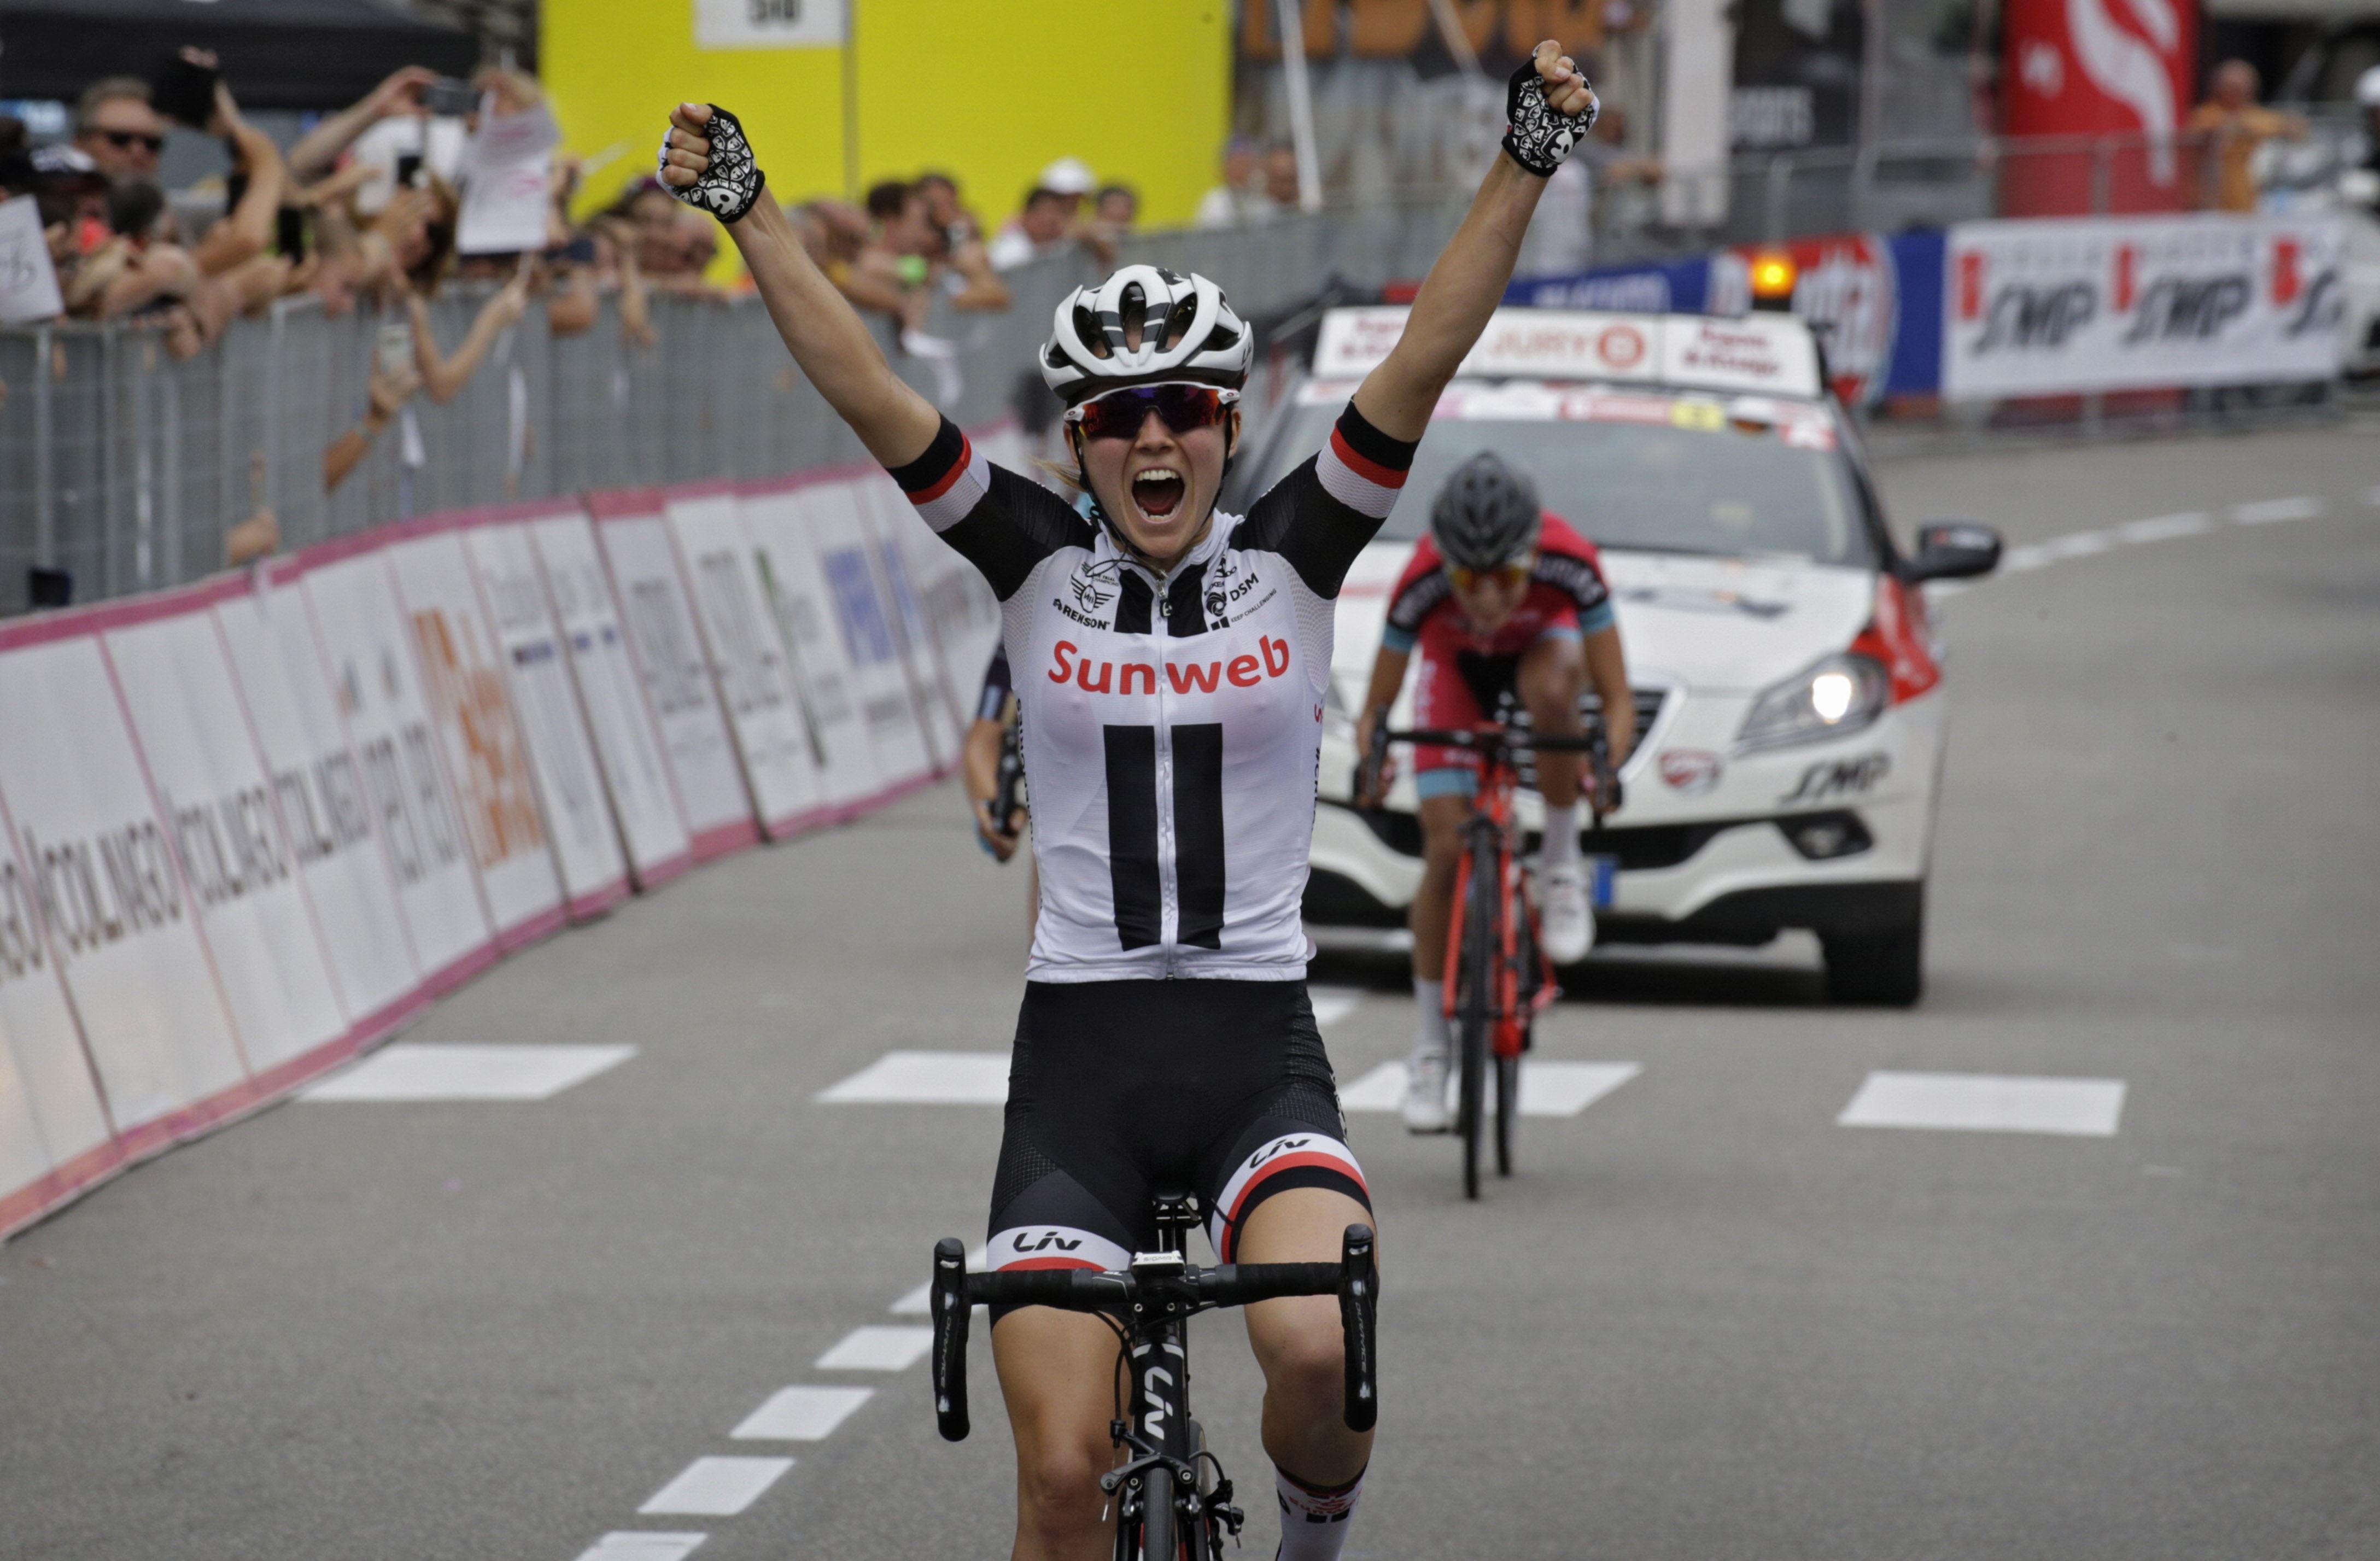 Giro Femminile Stage 5